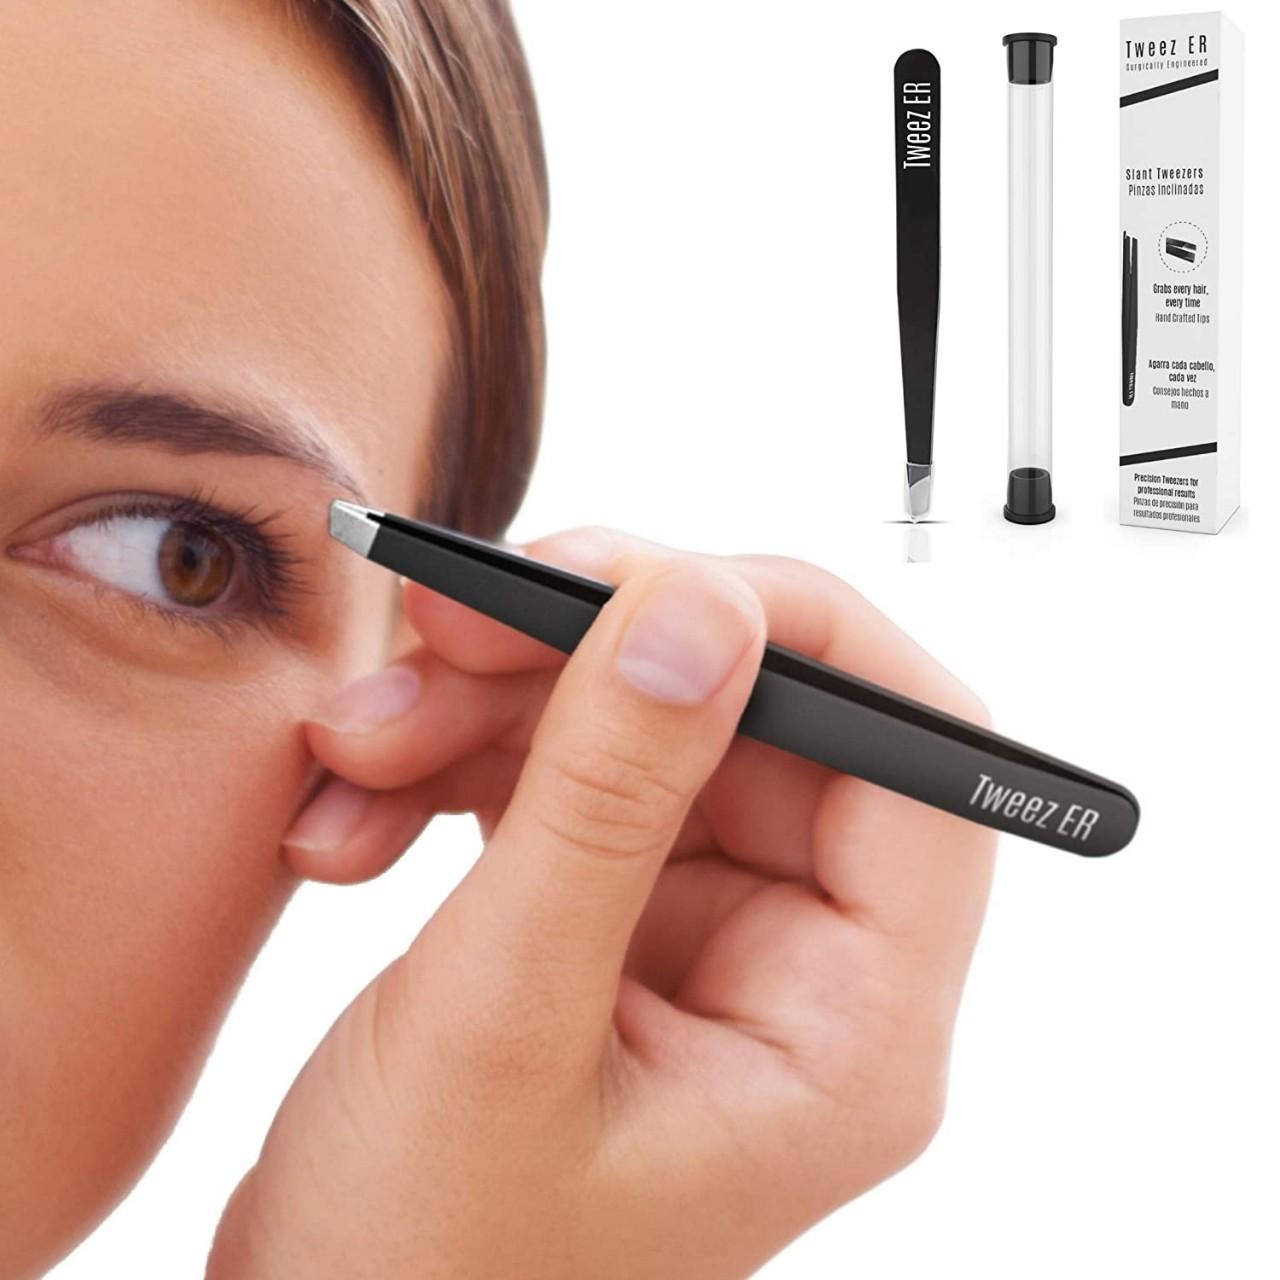 Slant Tweezers | Eyebrow Tweezer | Surgical Grade Hand Filed Slanted Tips for Professional Use, Best